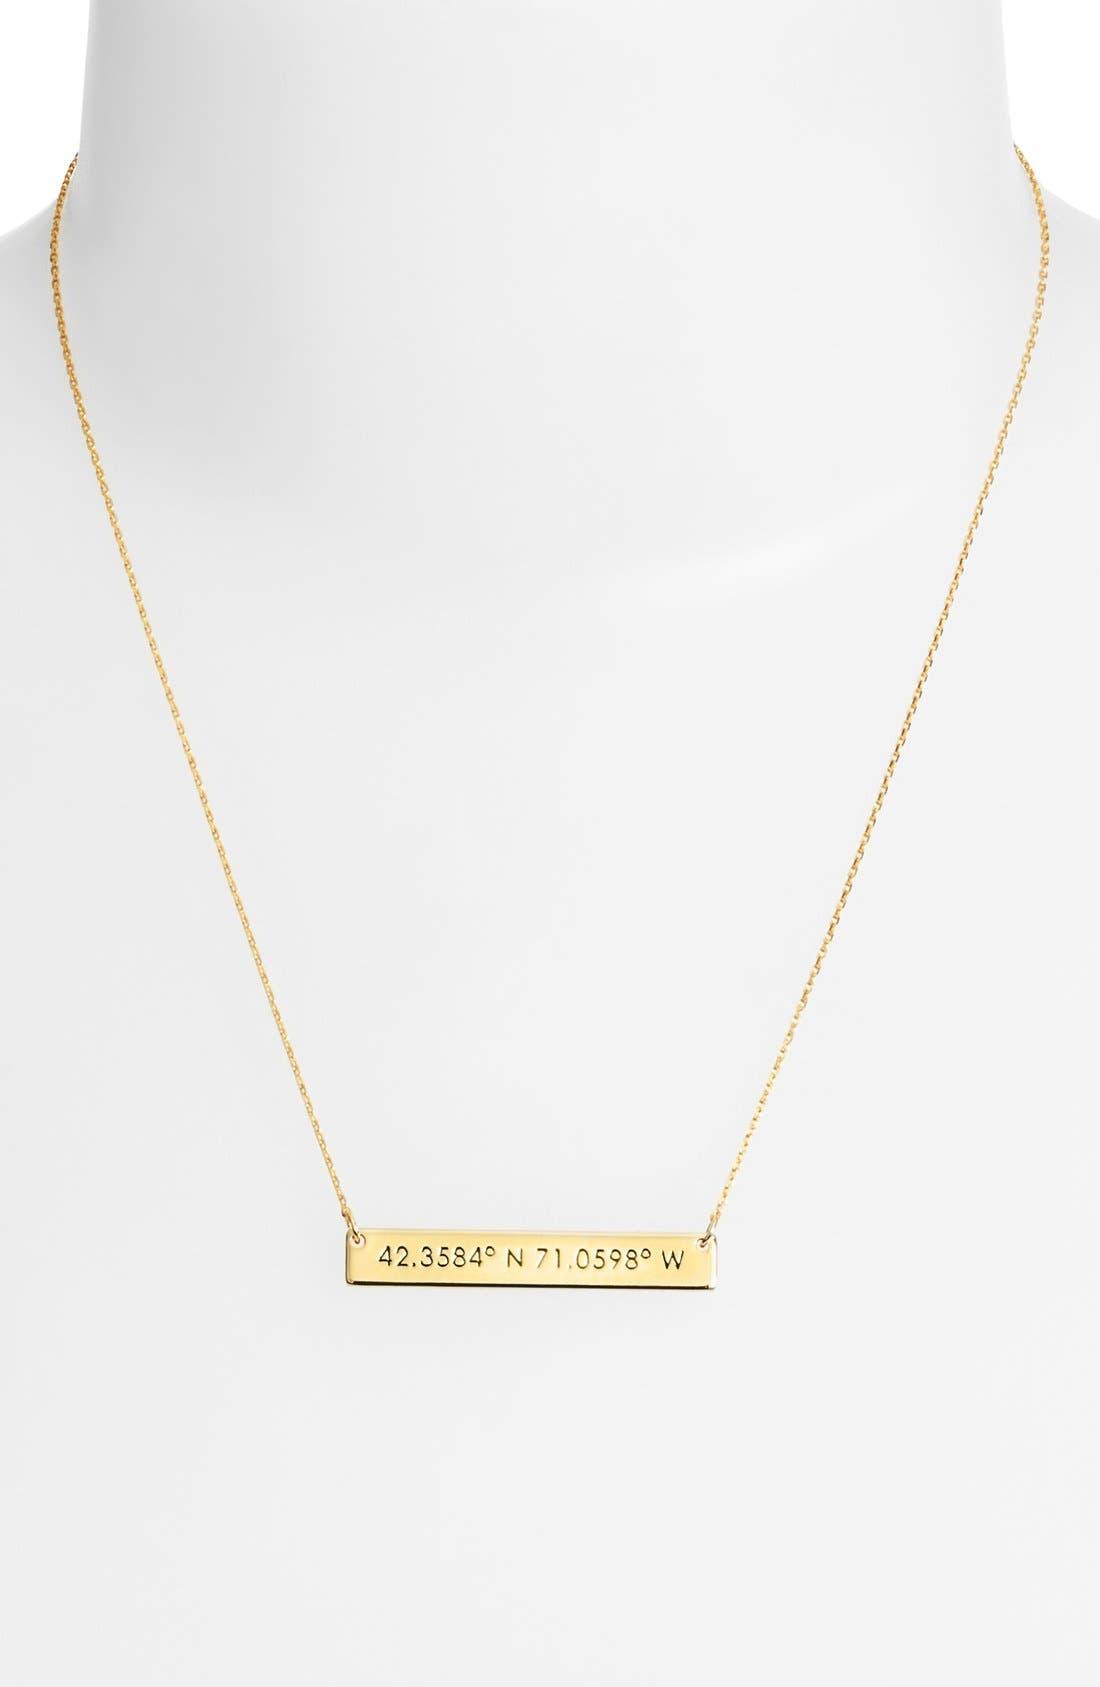 Coordinate Bar Pendant Necklace,                             Alternate thumbnail 2, color,                             Gold/ Boston